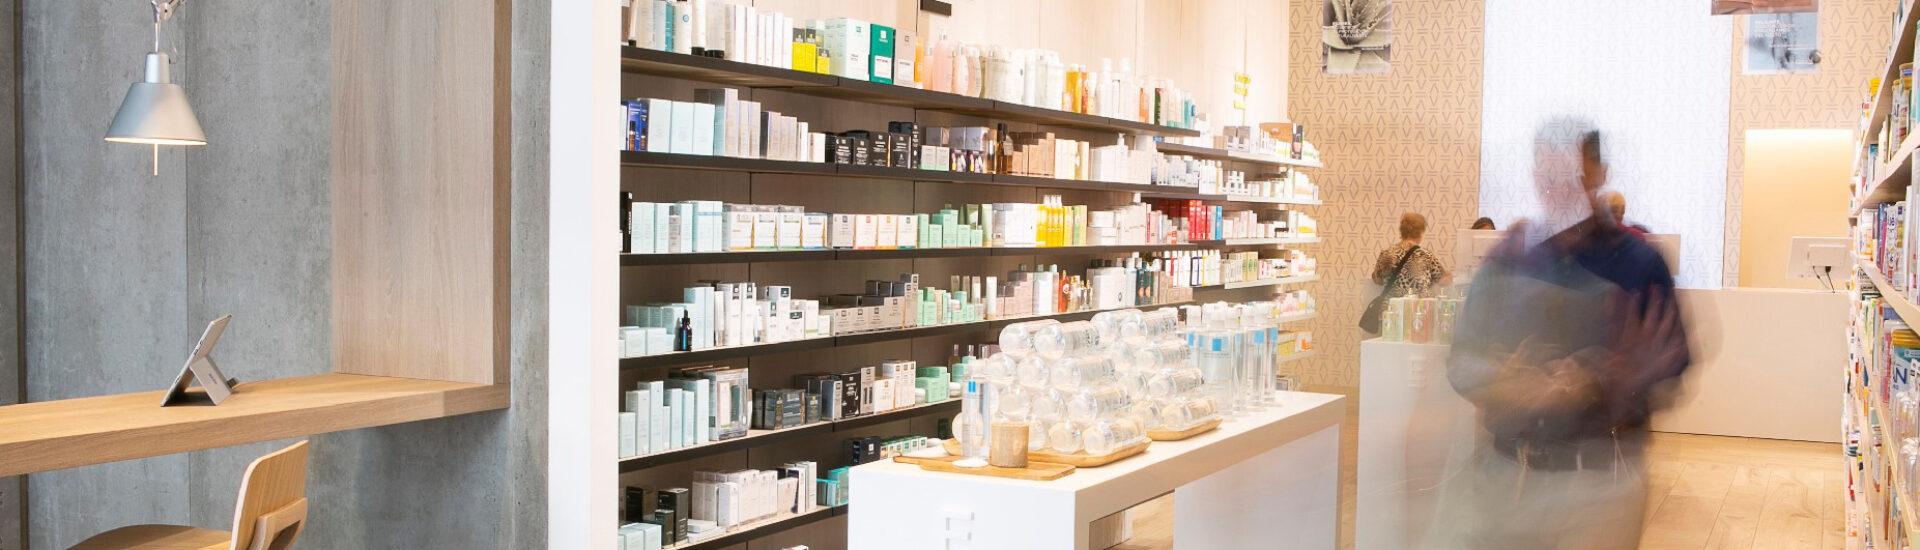 Mostrador de farmacia.